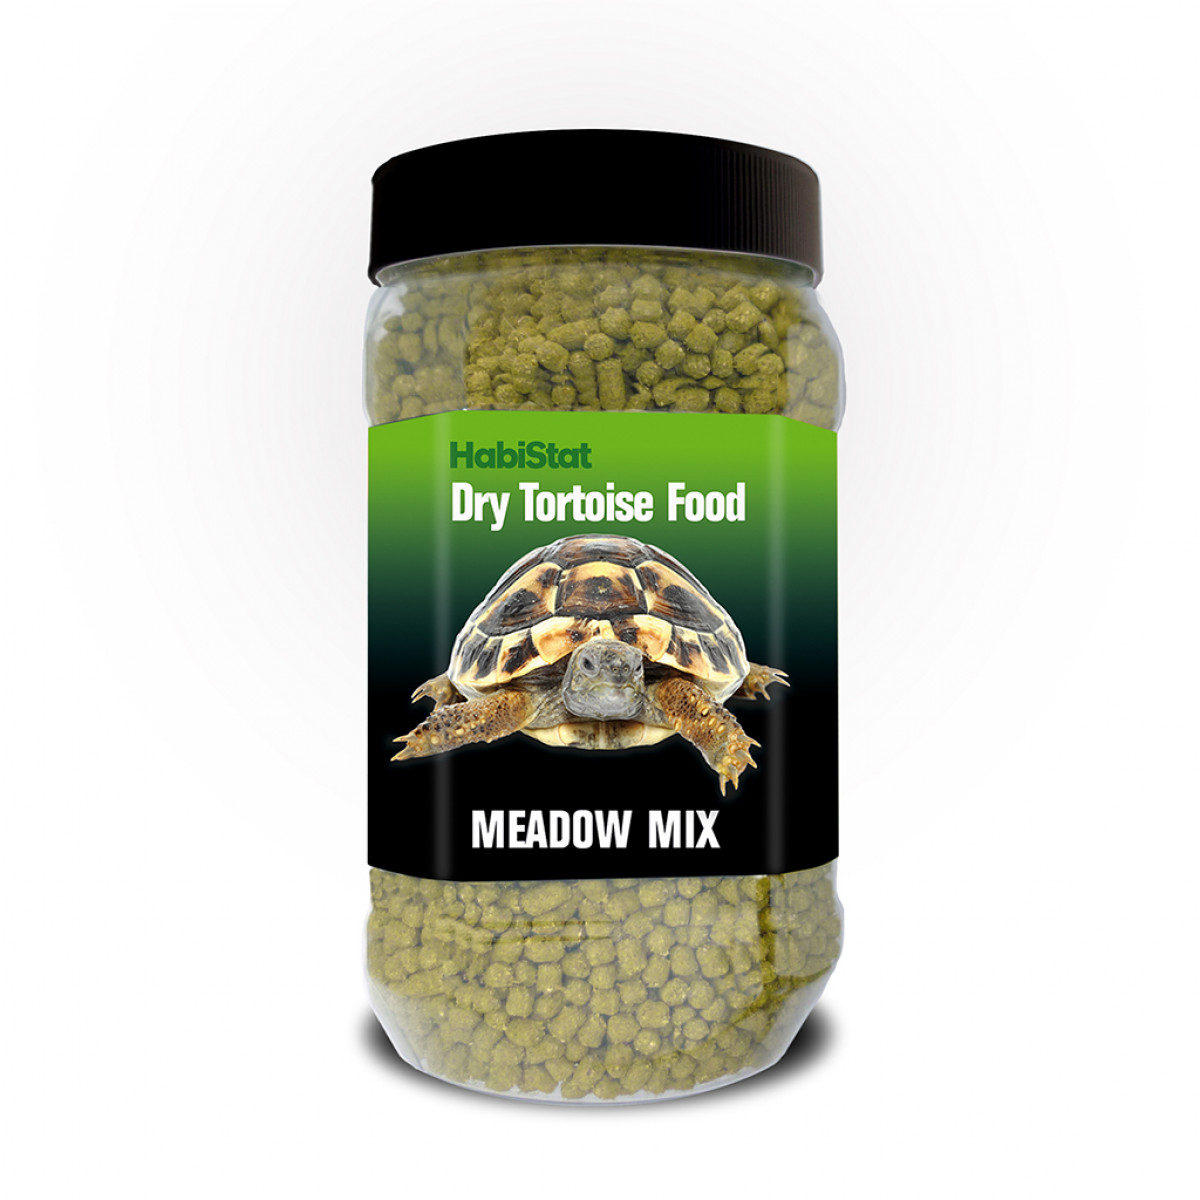 Habistat Tortoise Food - Meadow Mix, 400g